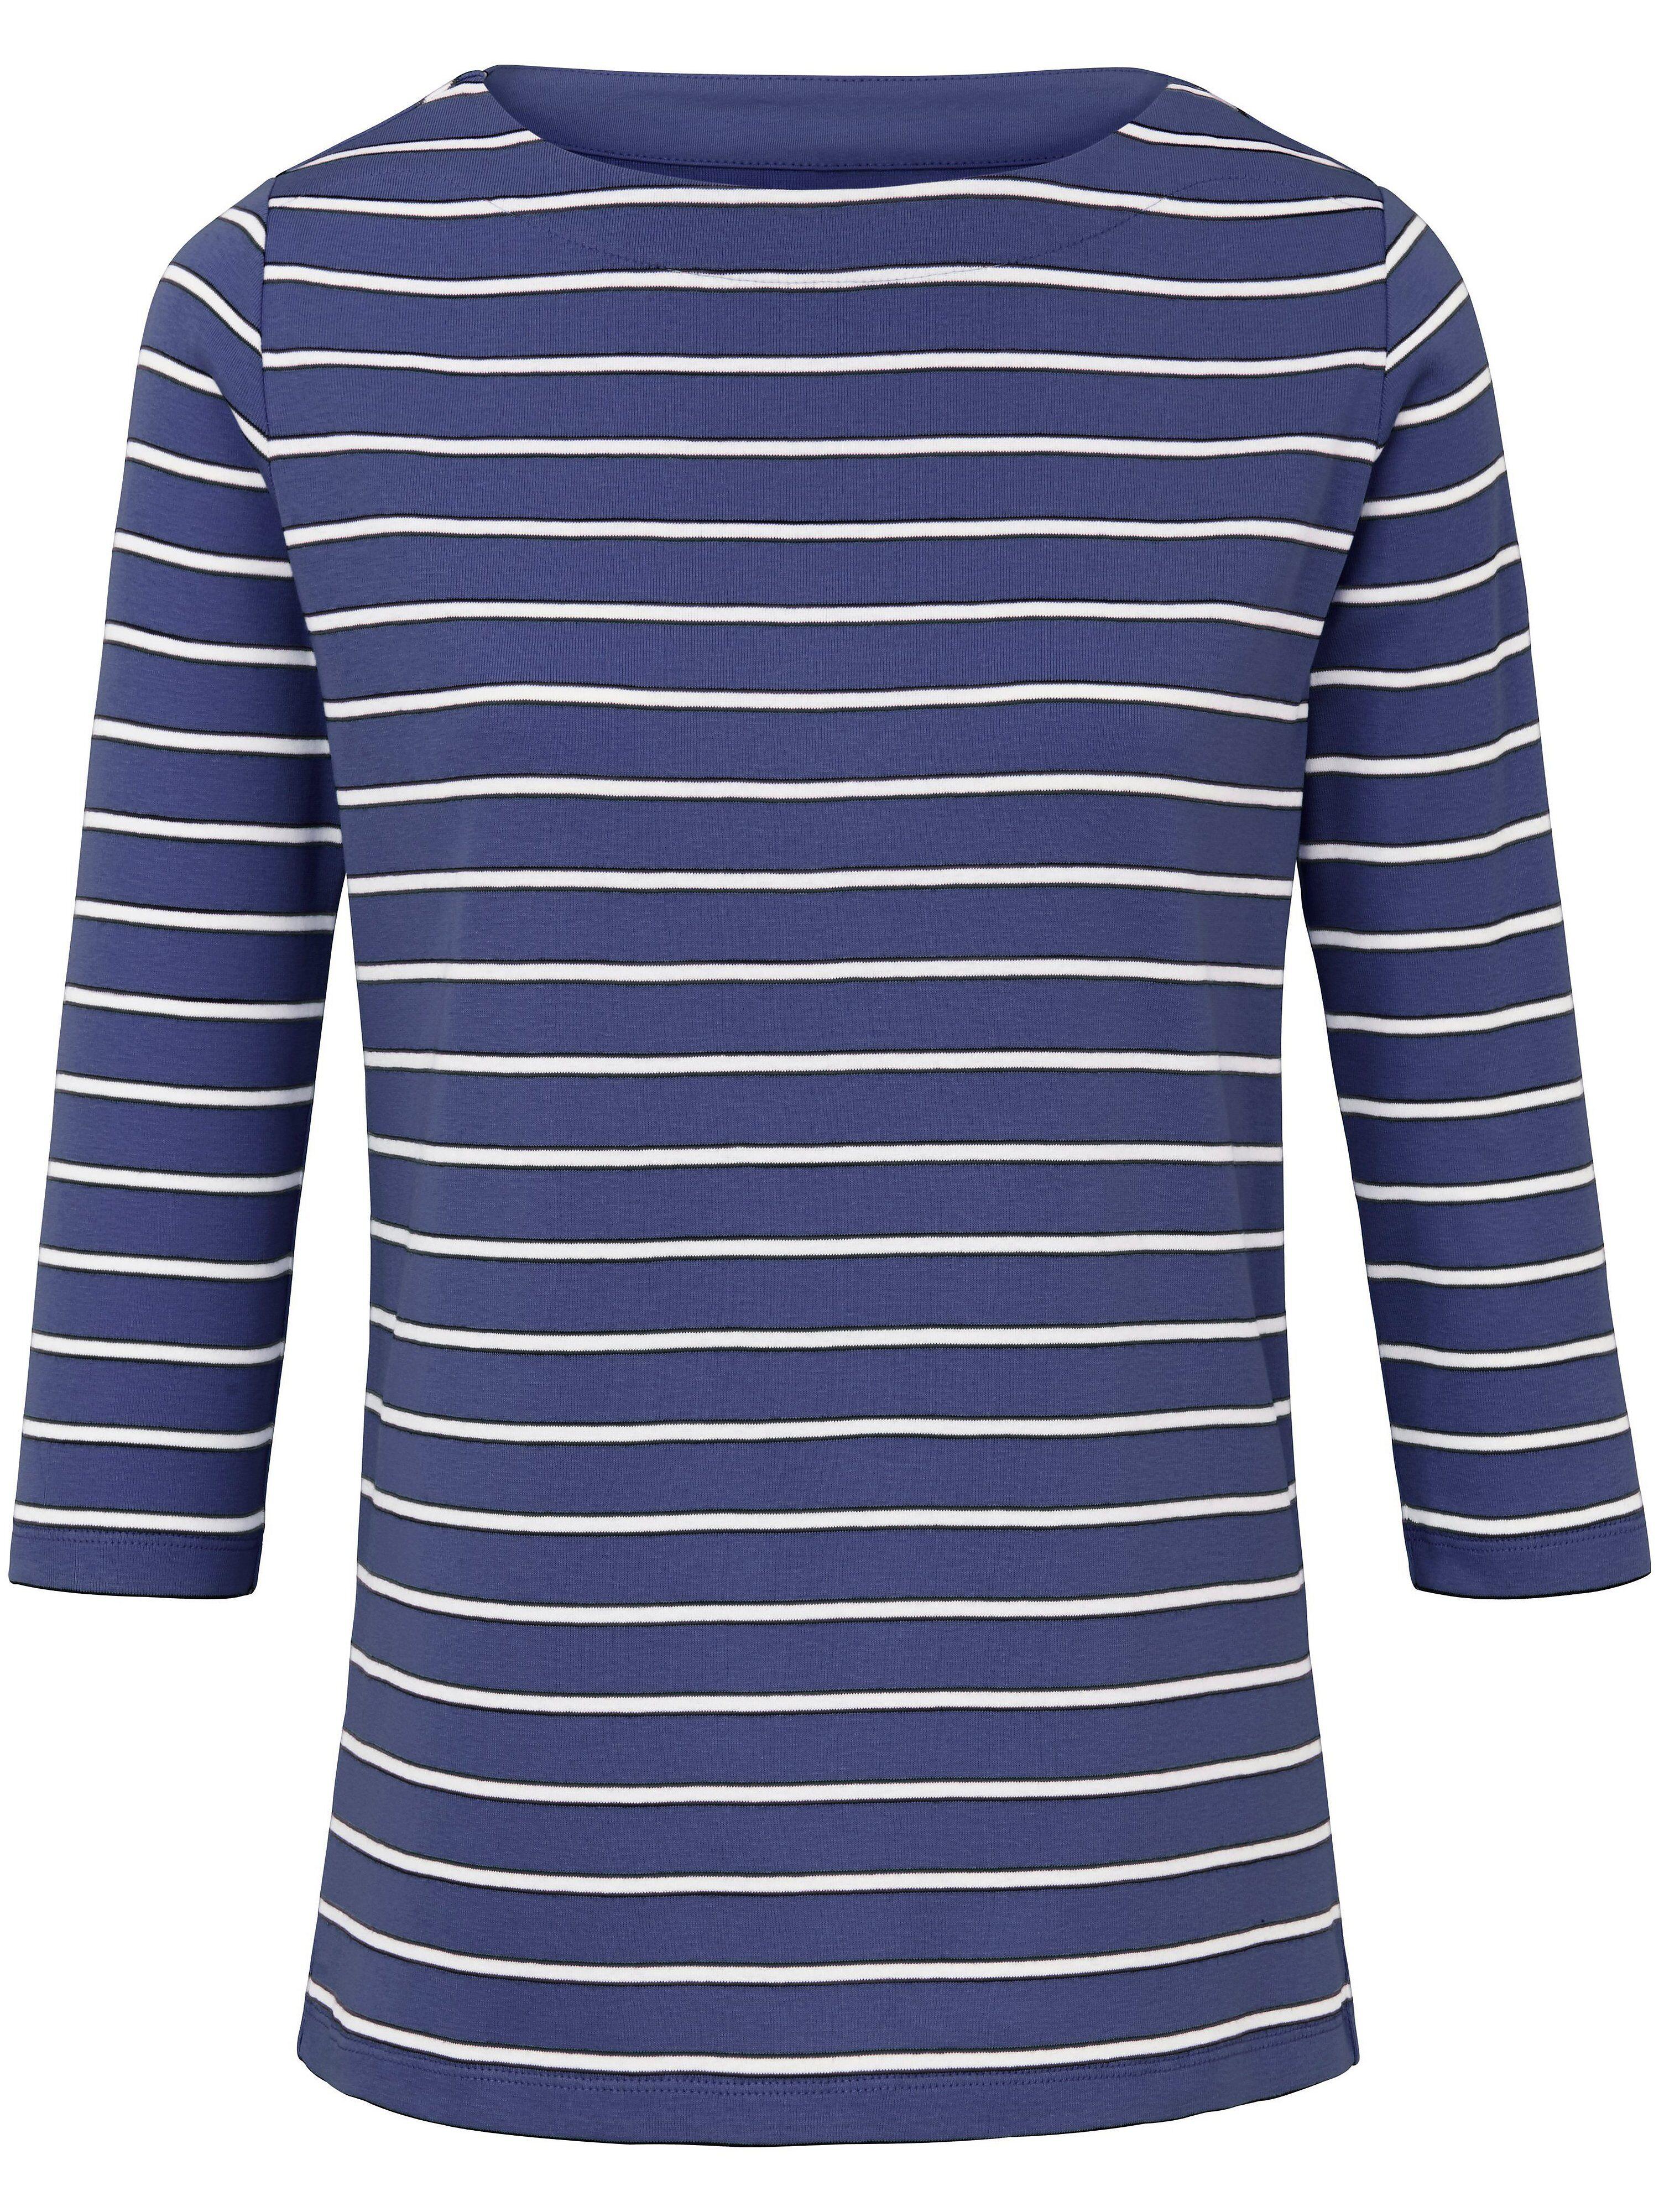 Bogner Le T-shirt manches 3/4 en coton  Bogner bleu  - Femme - 38